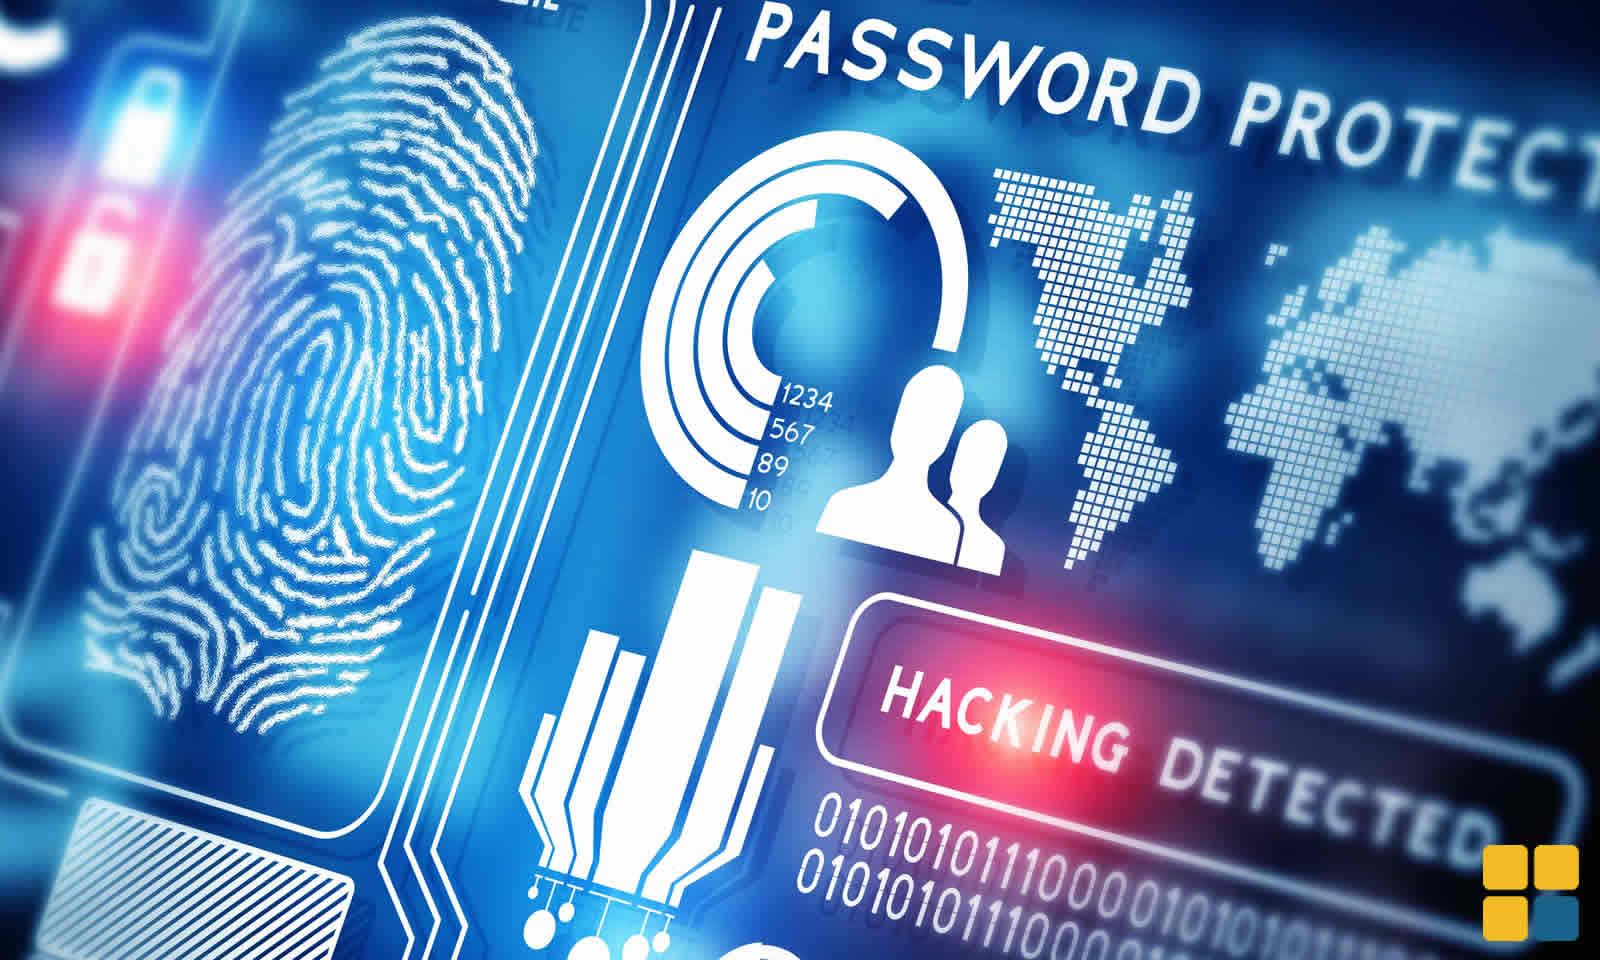 Hacker detectado senha protegida